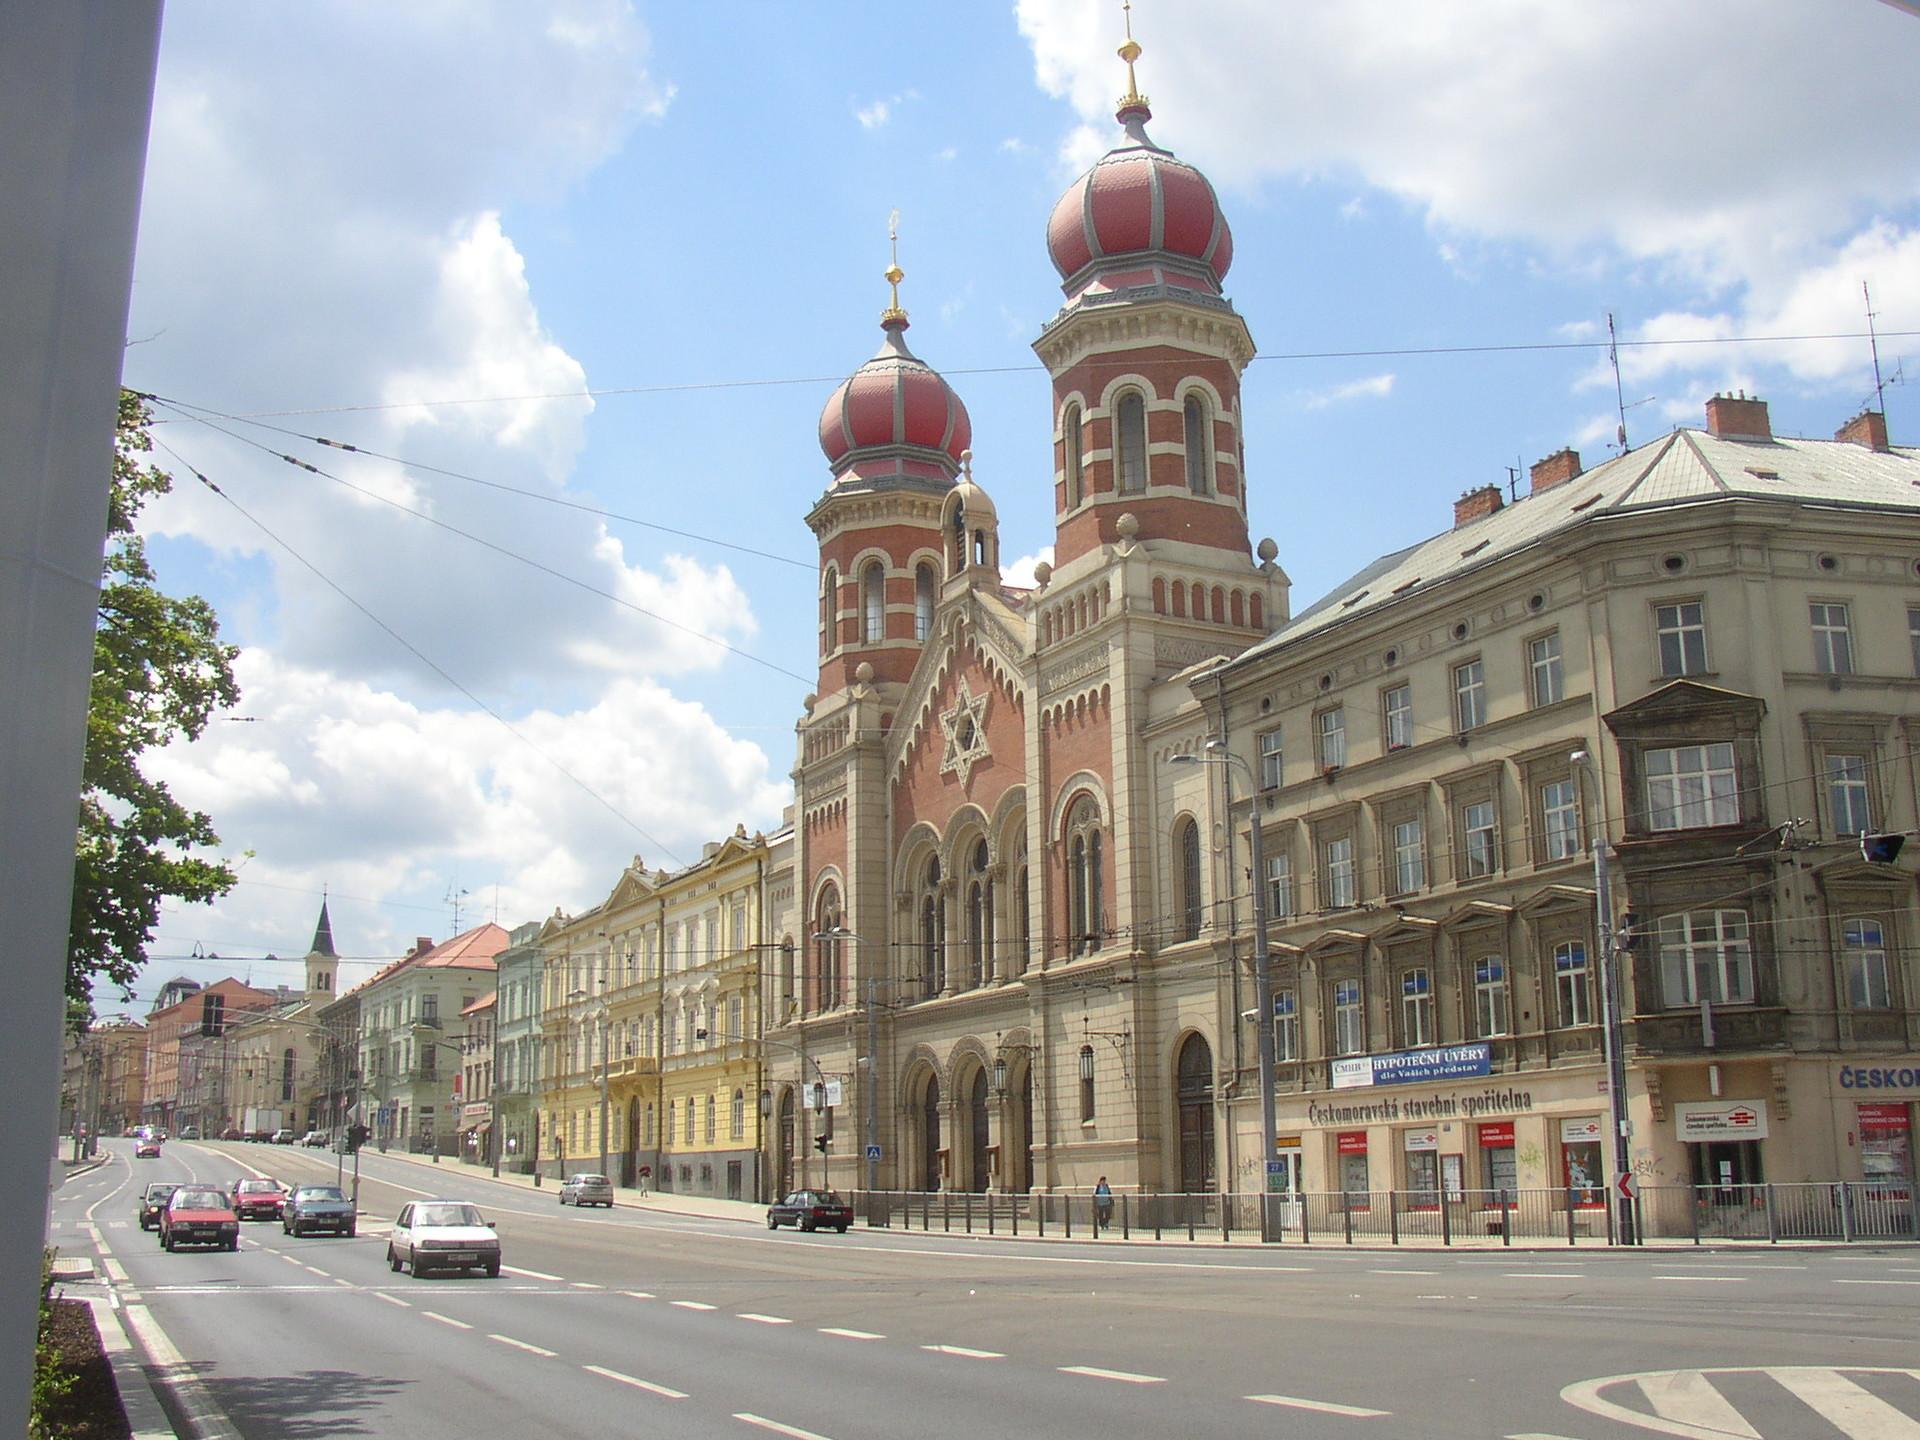 Esperienza Erasmus a Plzeň, Repubblica Ceca